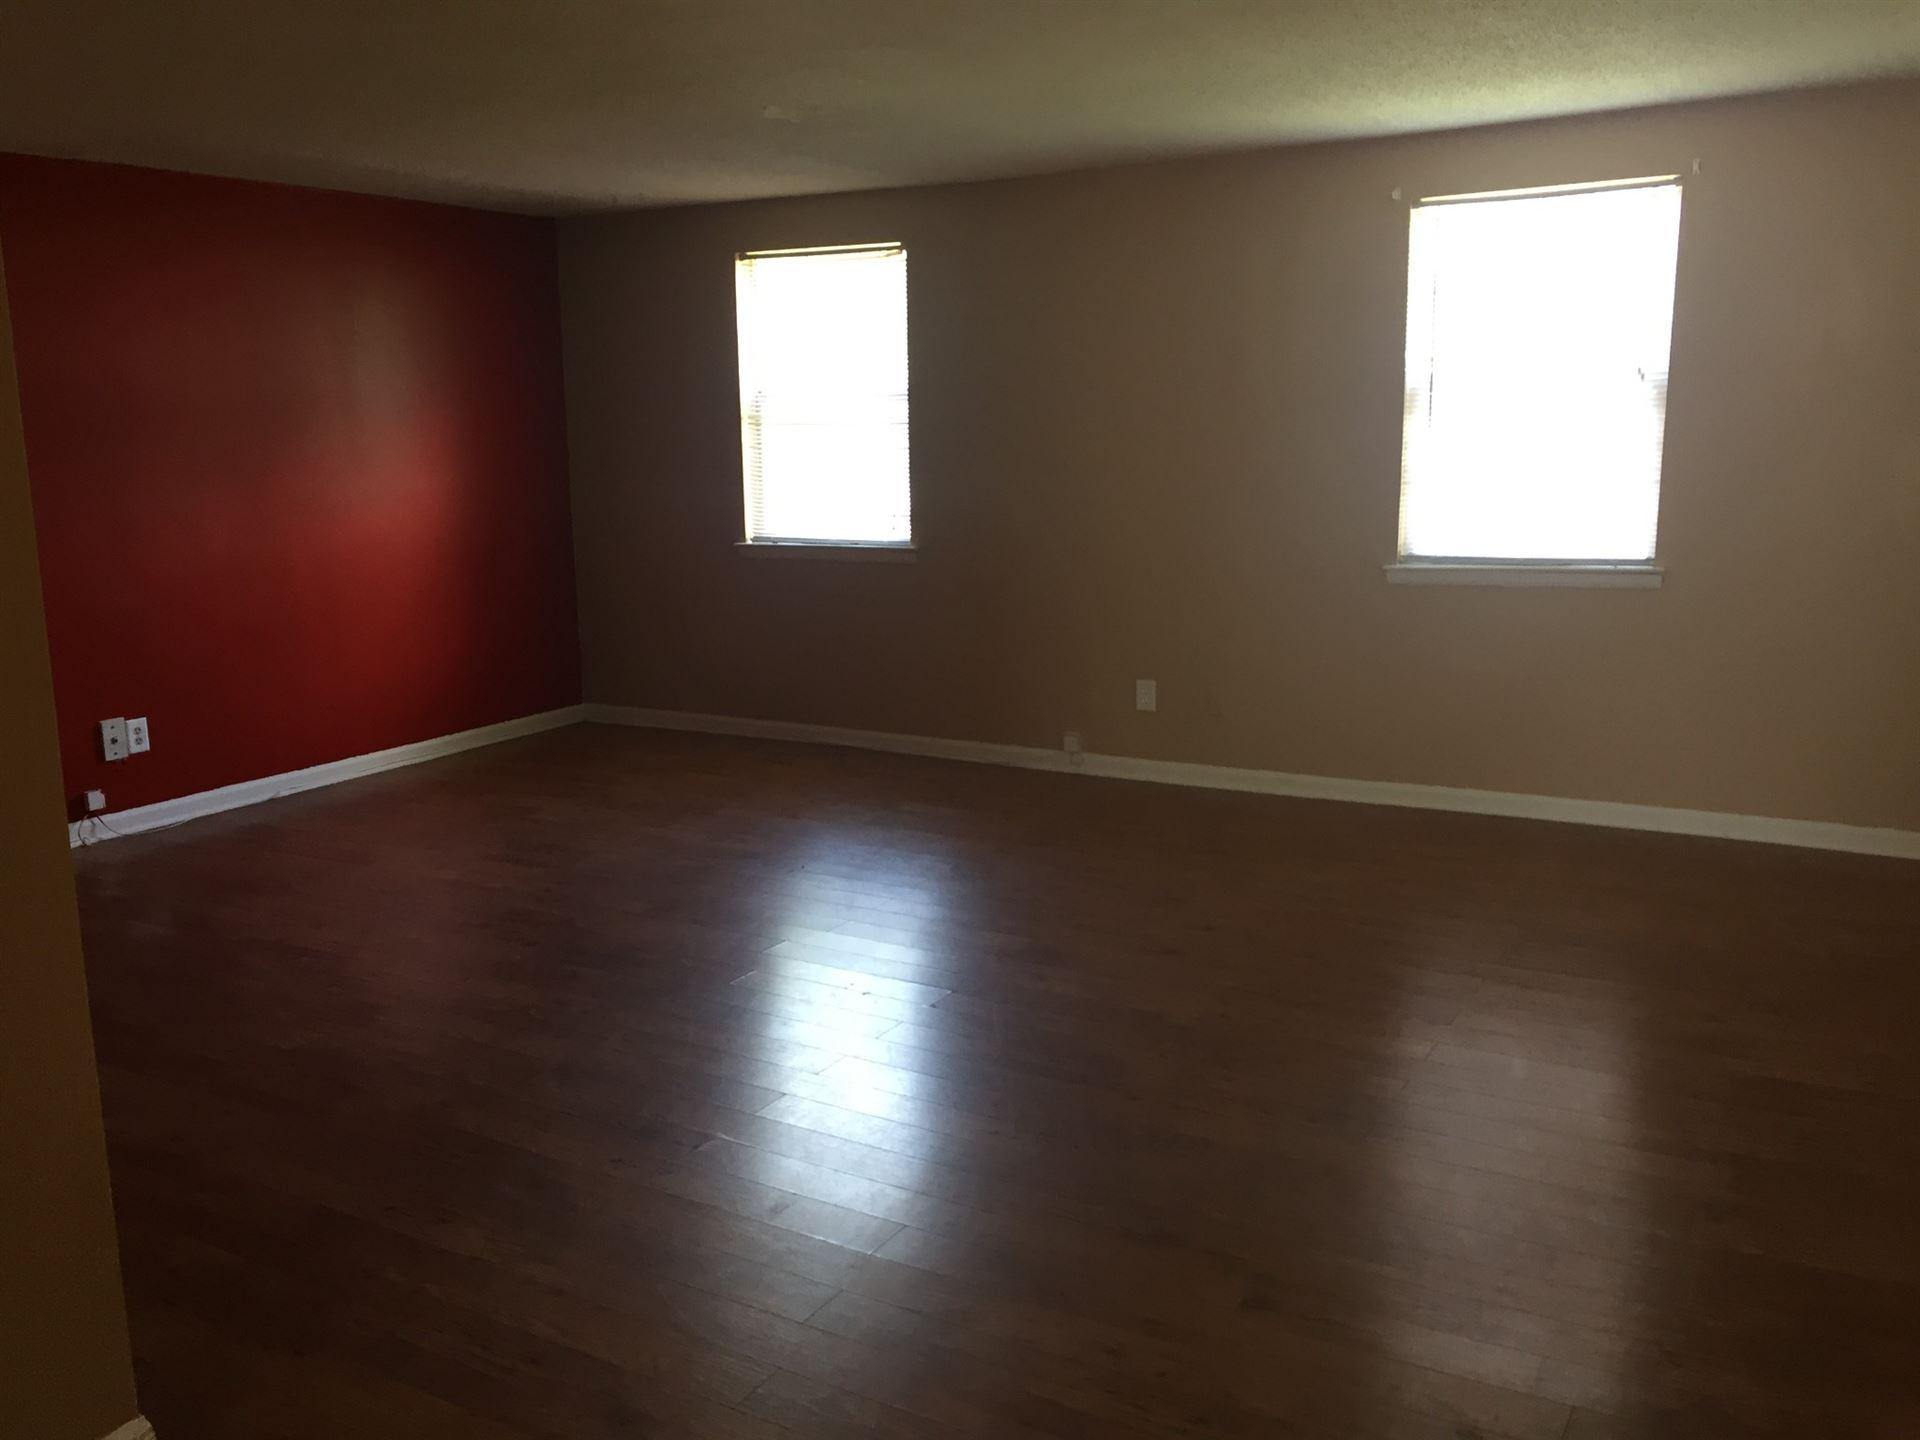 1301 Neelys Bend Rd #B16, Madison, TN 37115 - MLS#: 2203381